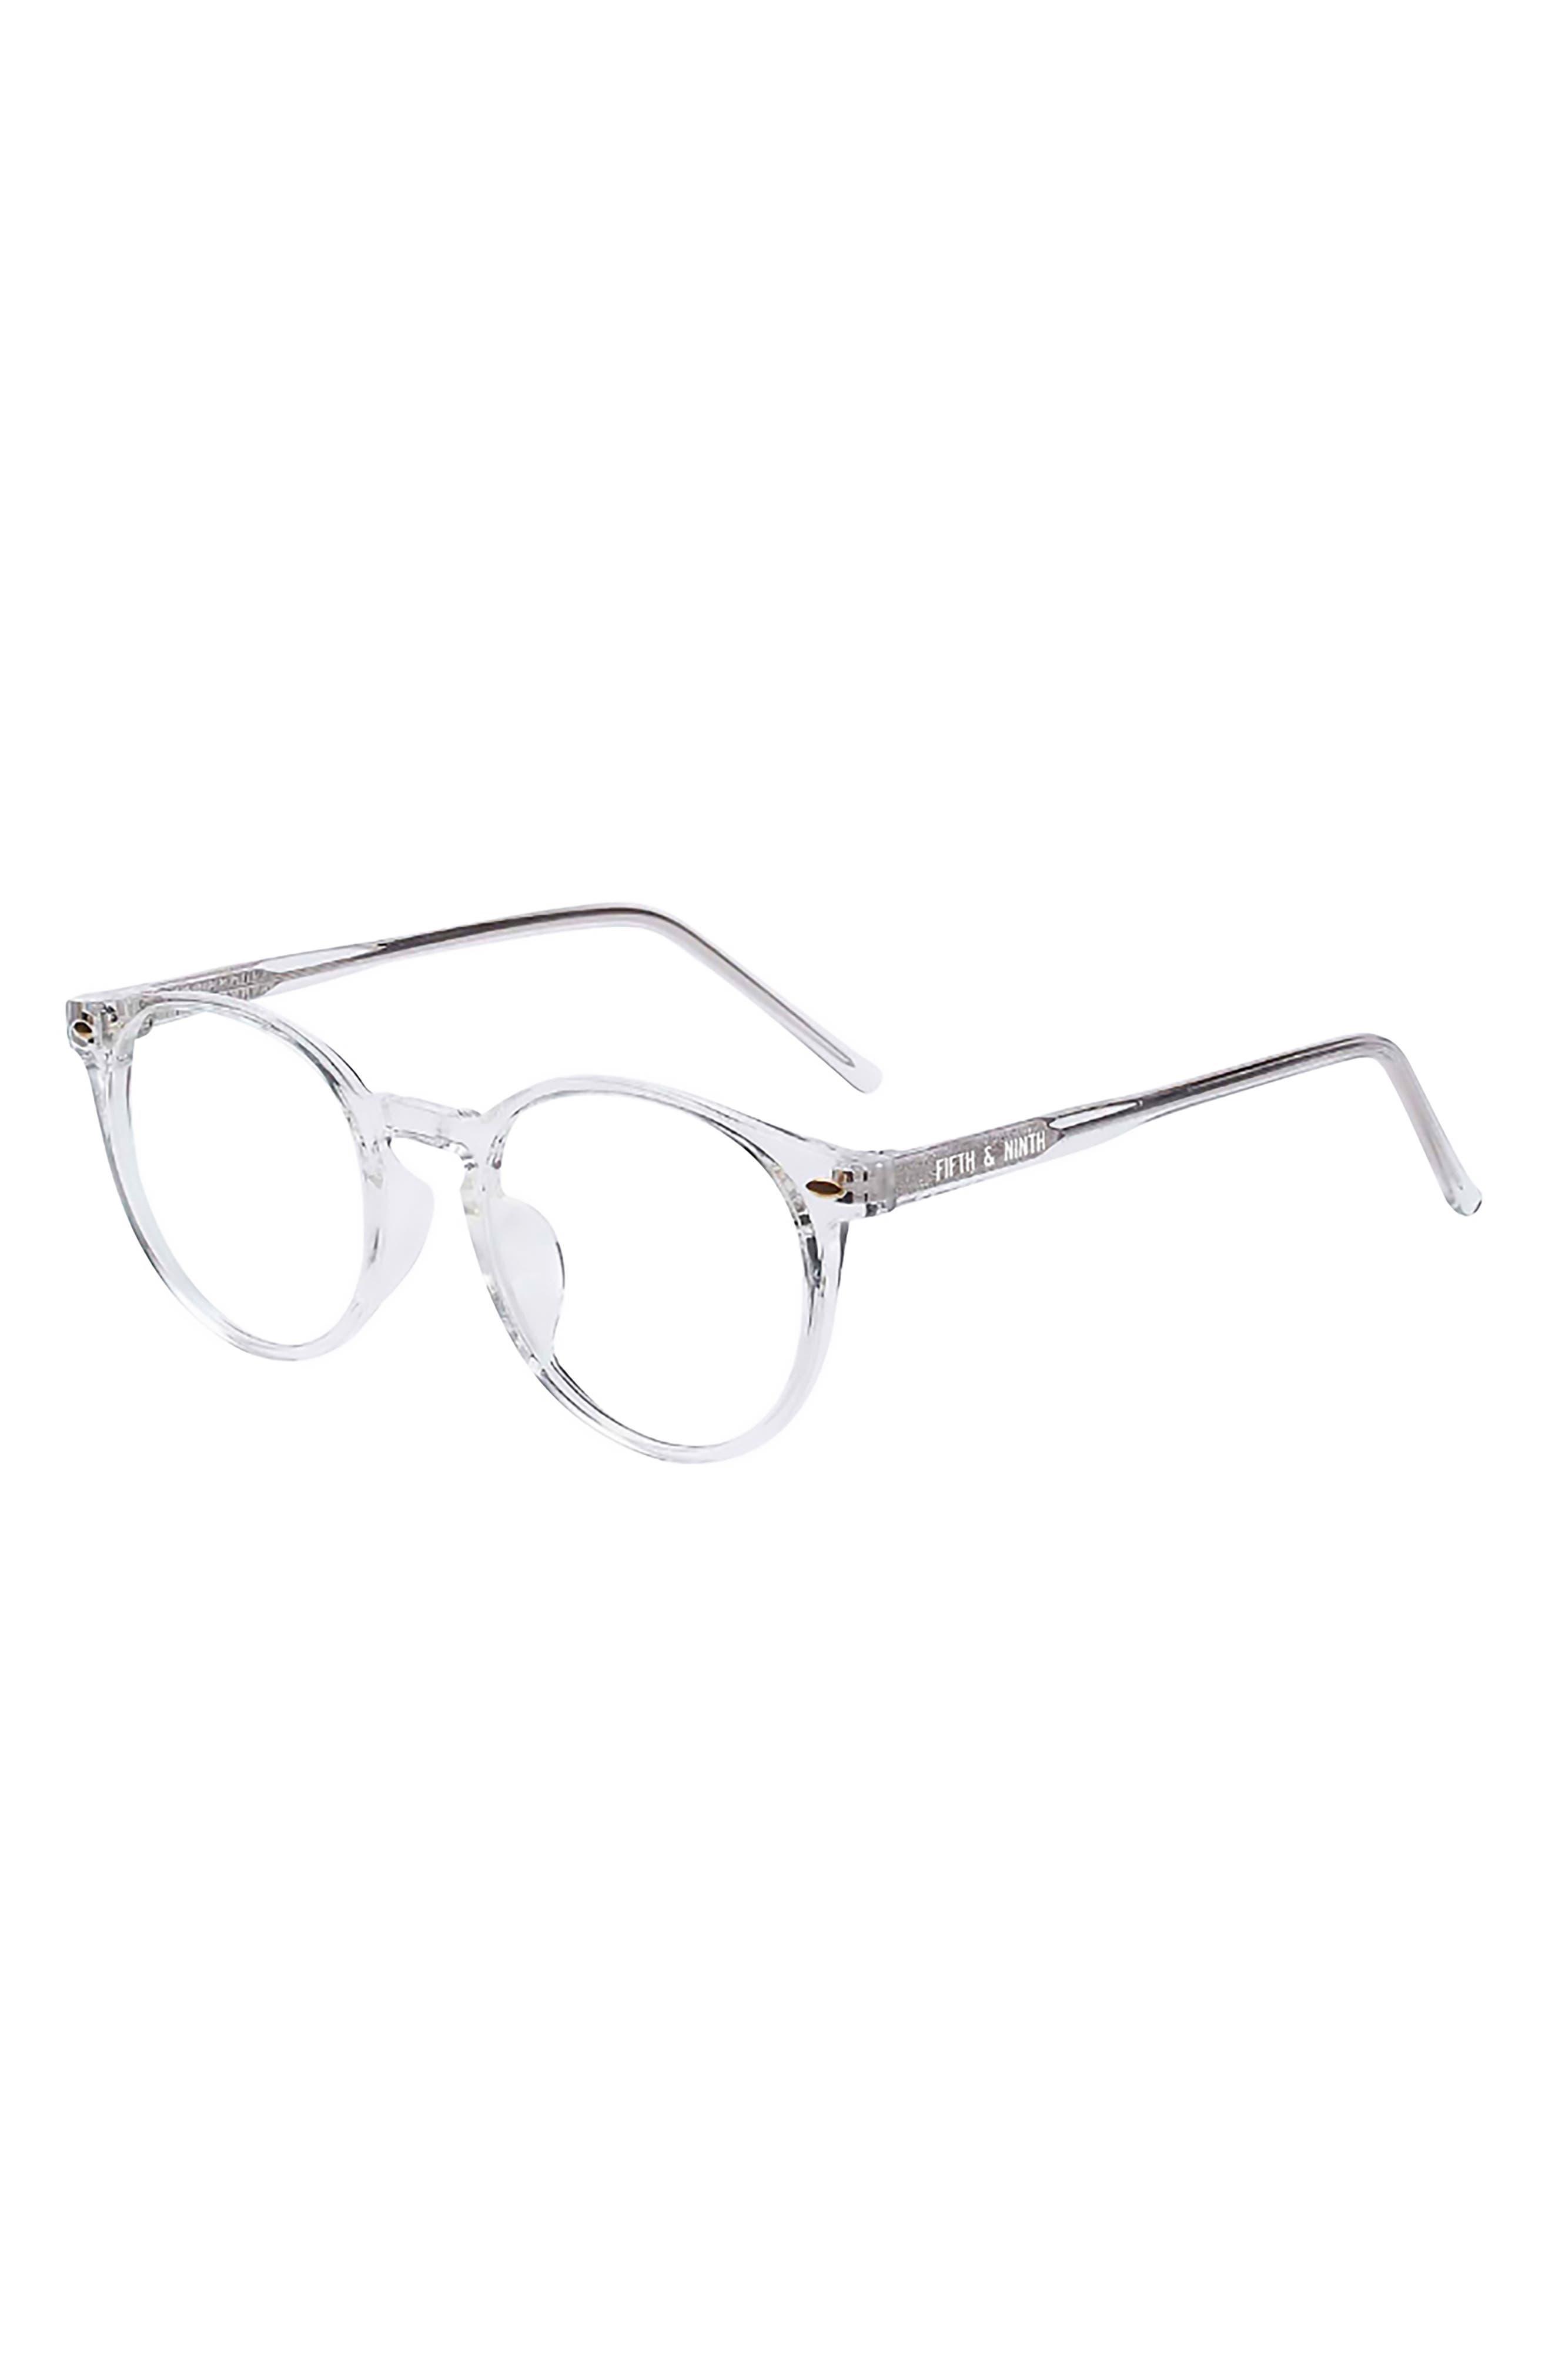 Dakota 48mm Round Blue Light Blocking Glasses